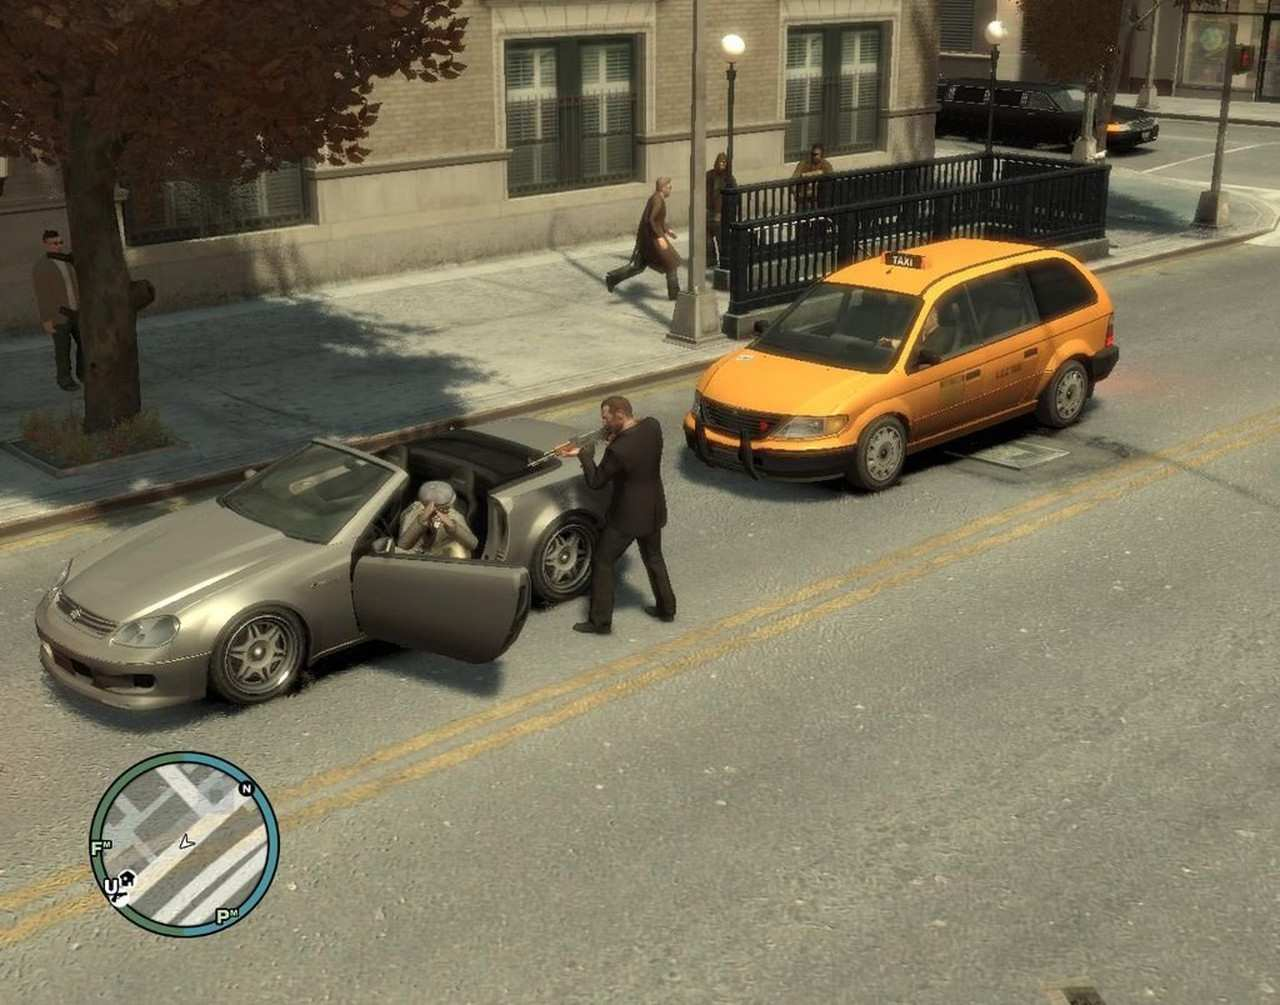 GTA 4 - Grand Theft Auto IV free Download + DLC